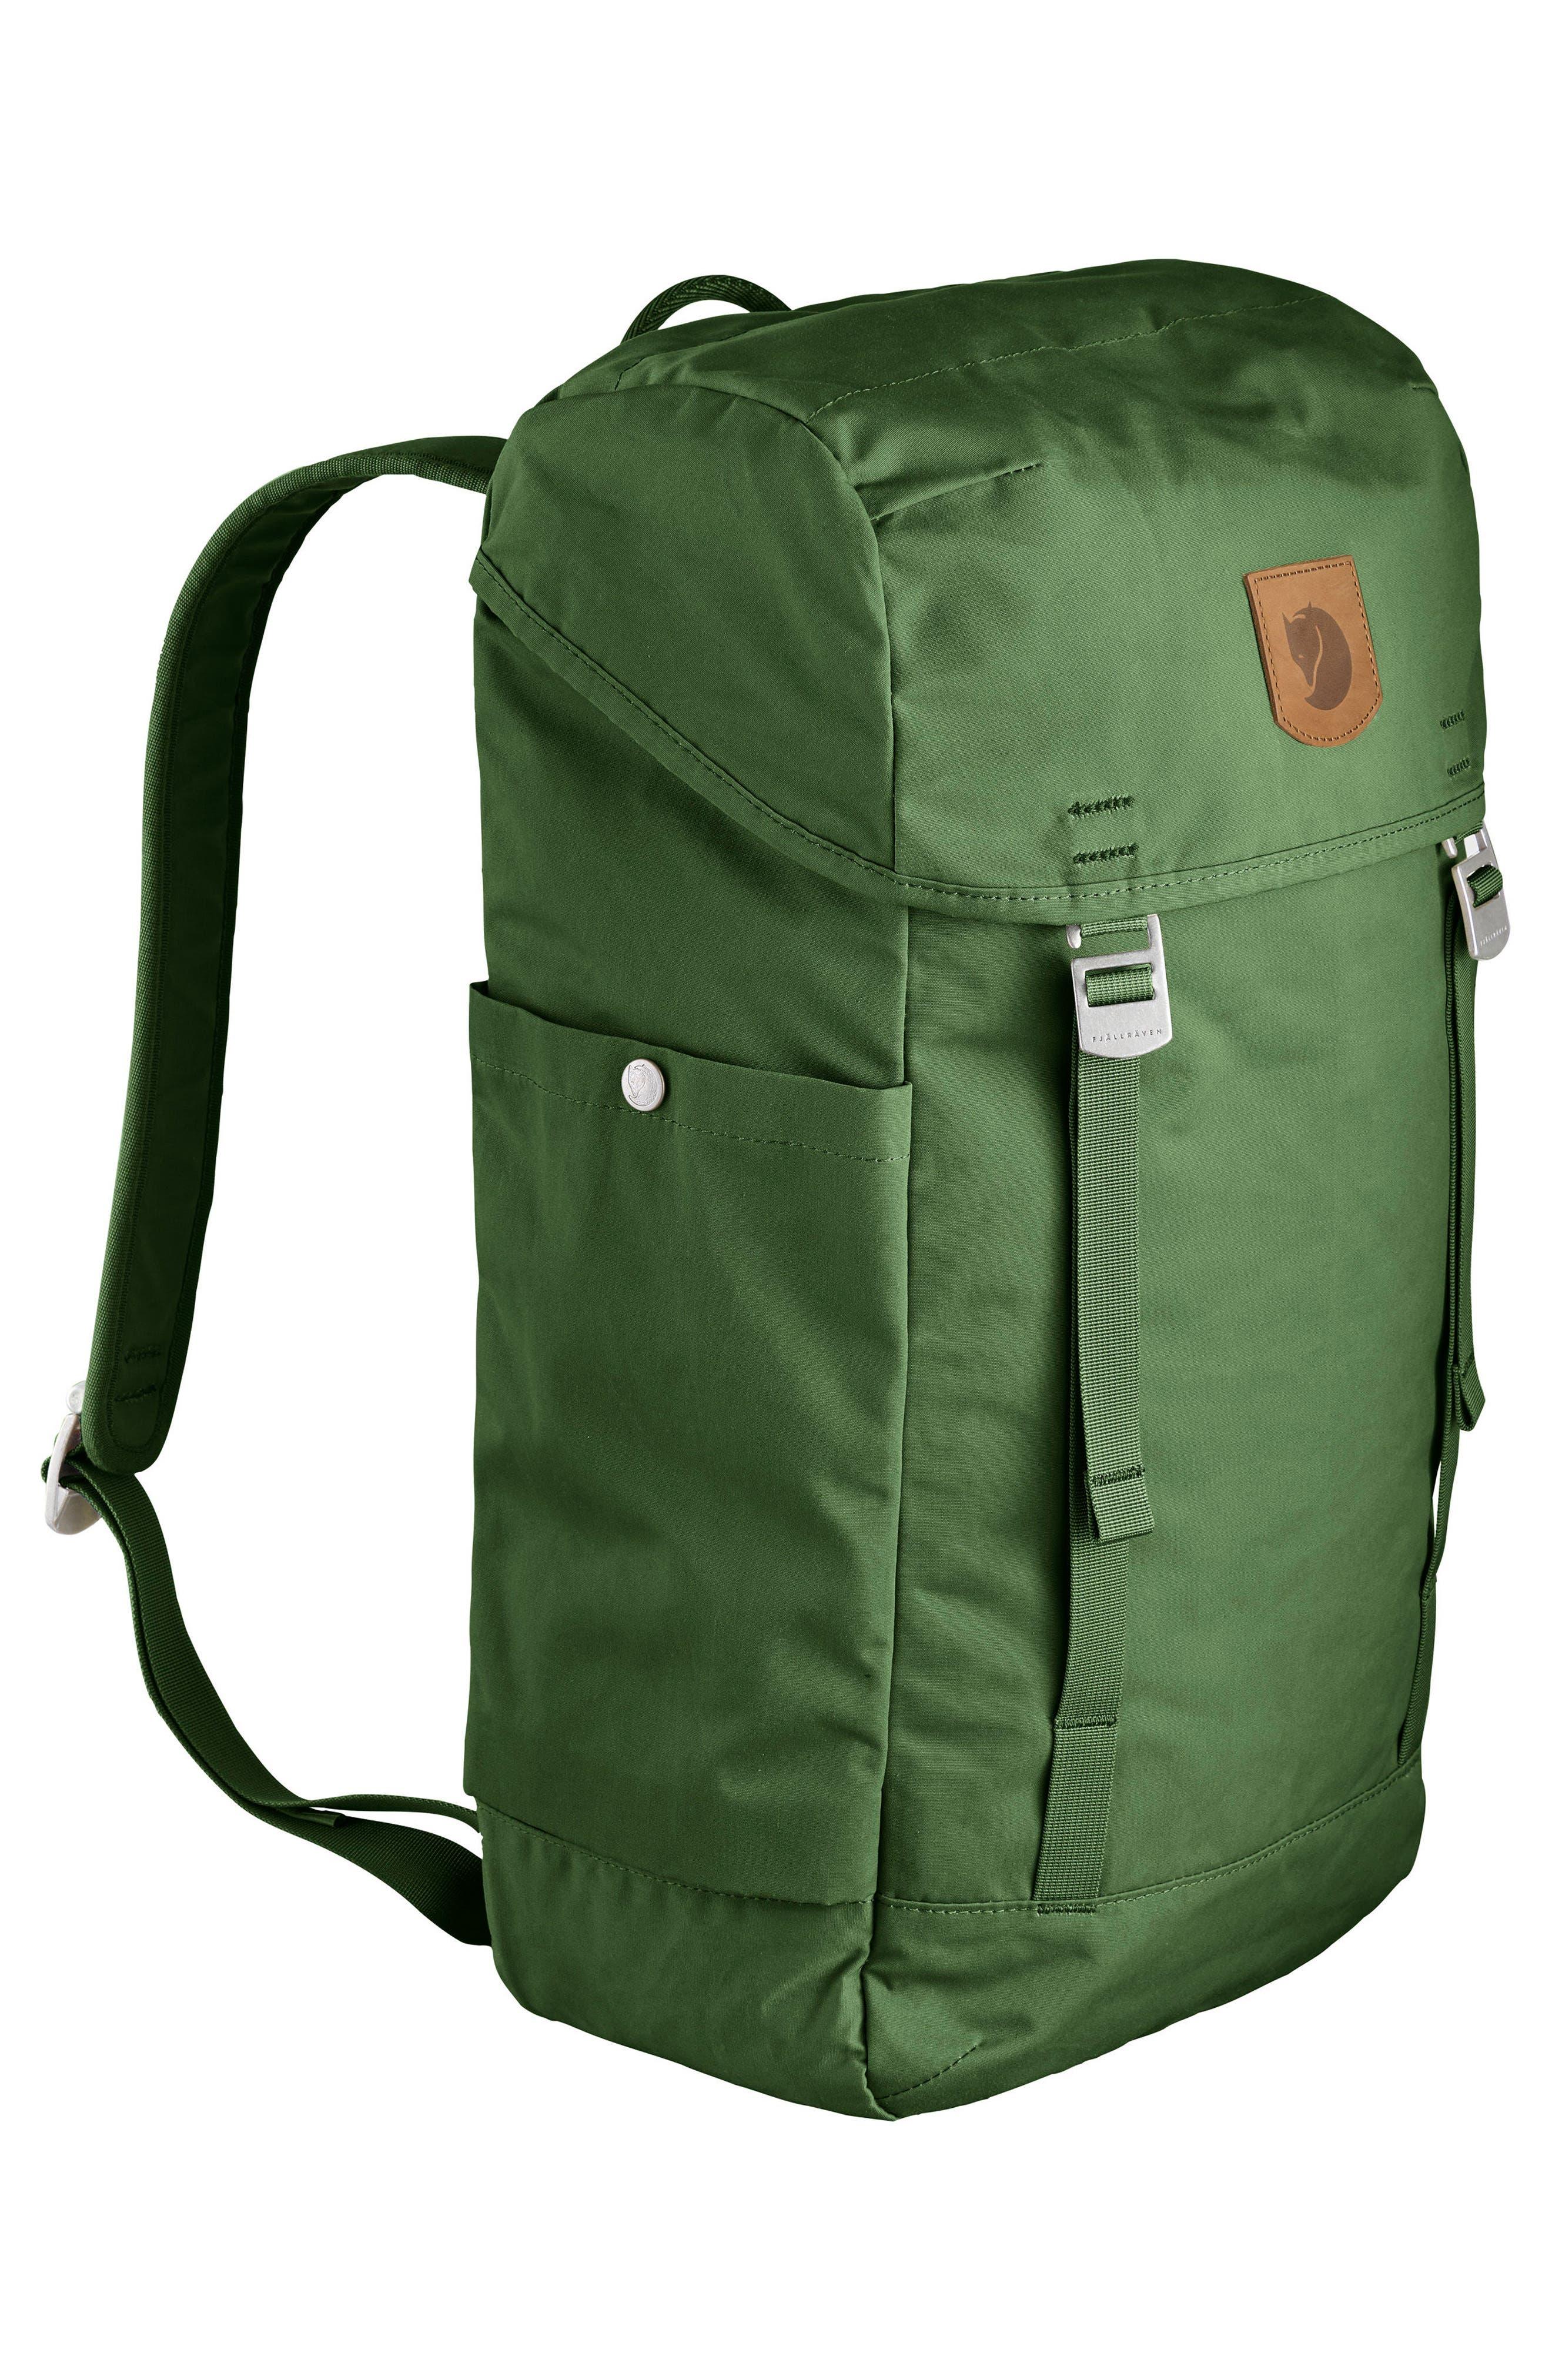 Greenland Large Backpack,                             Alternate thumbnail 3, color,                             FERN